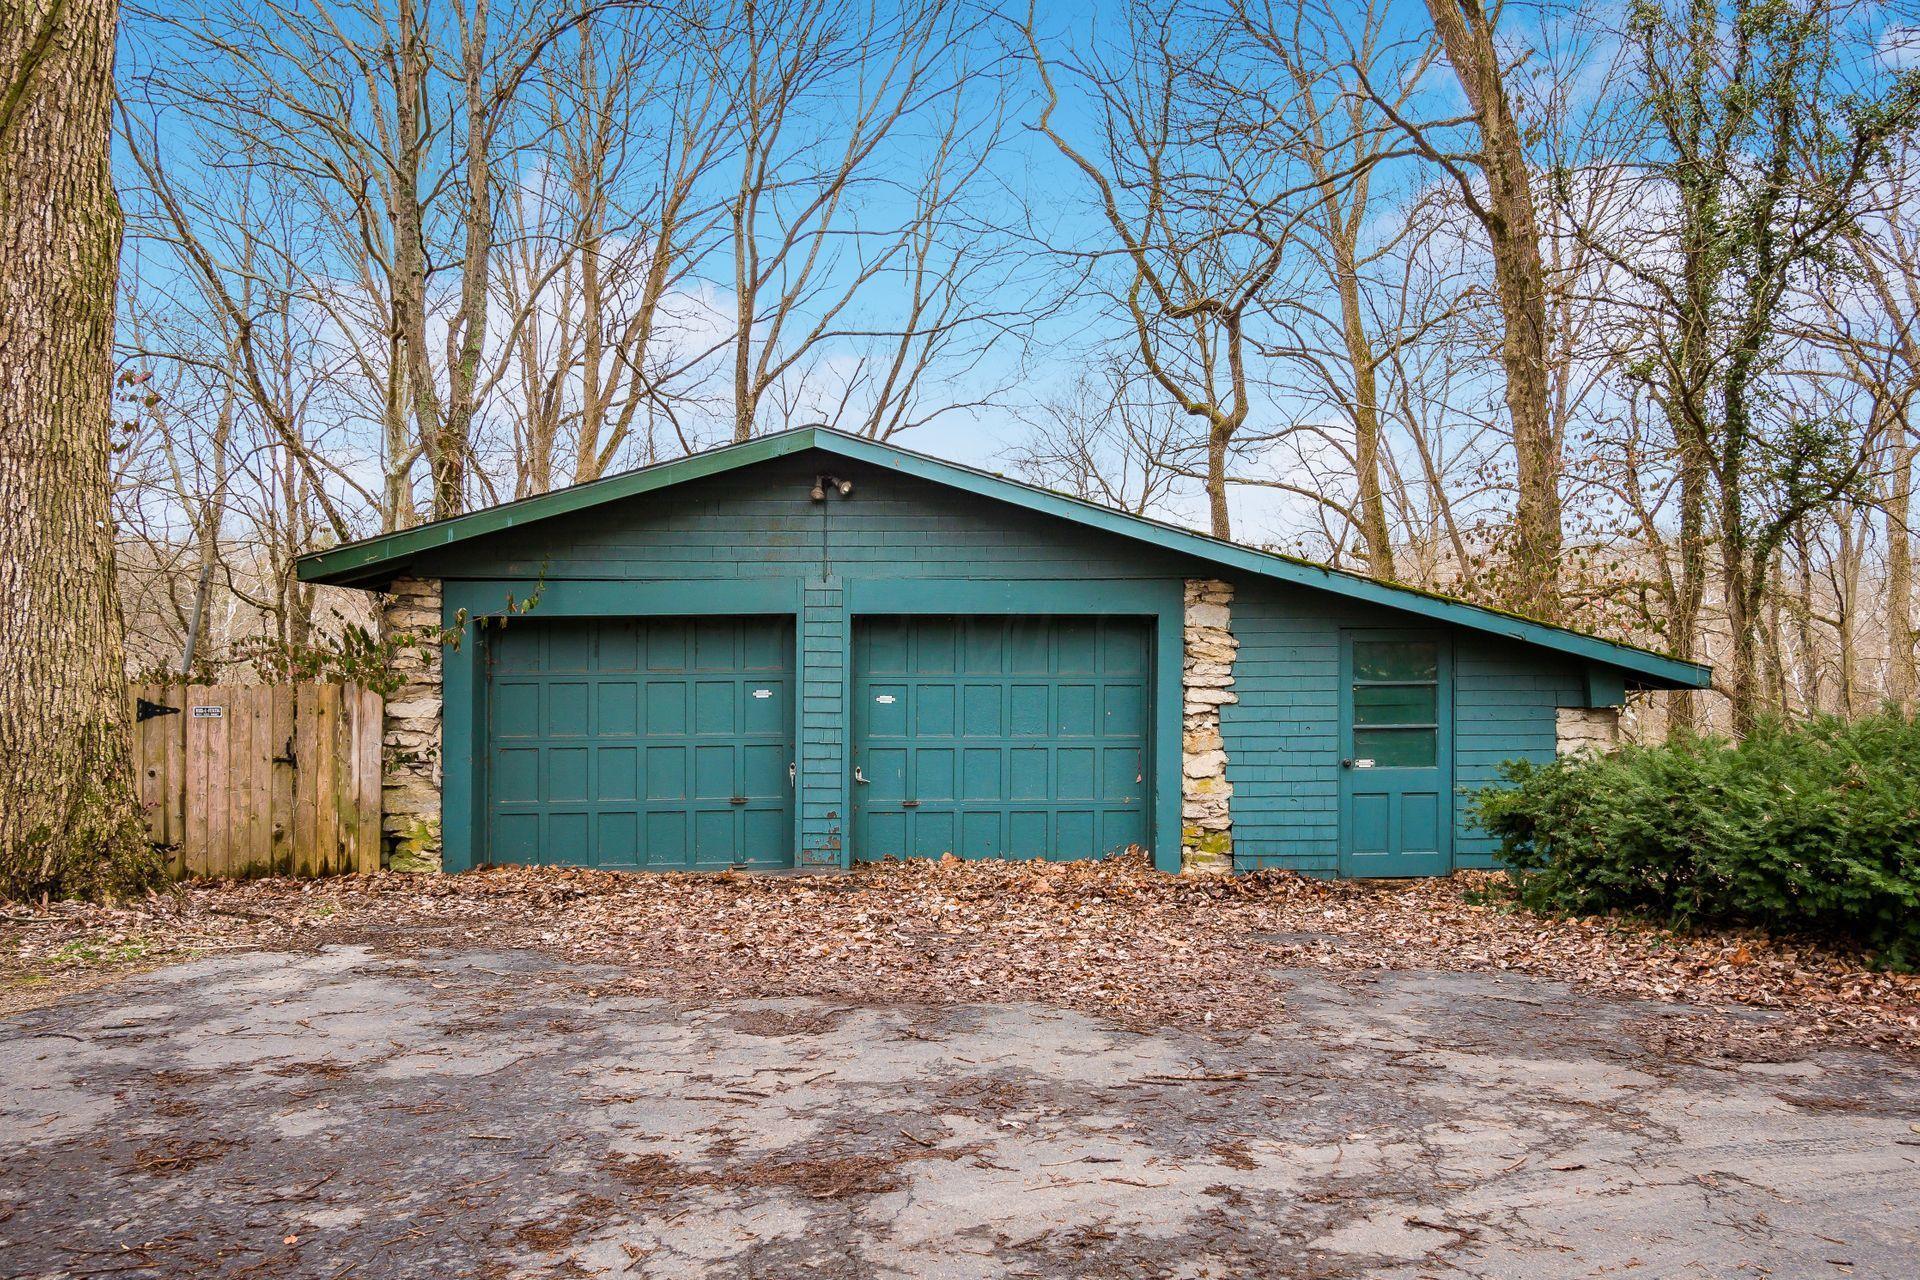 8201 Riverside Drive, Powell, Ohio 43065, 4 Bedrooms Bedrooms, ,4 BathroomsBathrooms,Residential,For Sale,Riverside,220043649